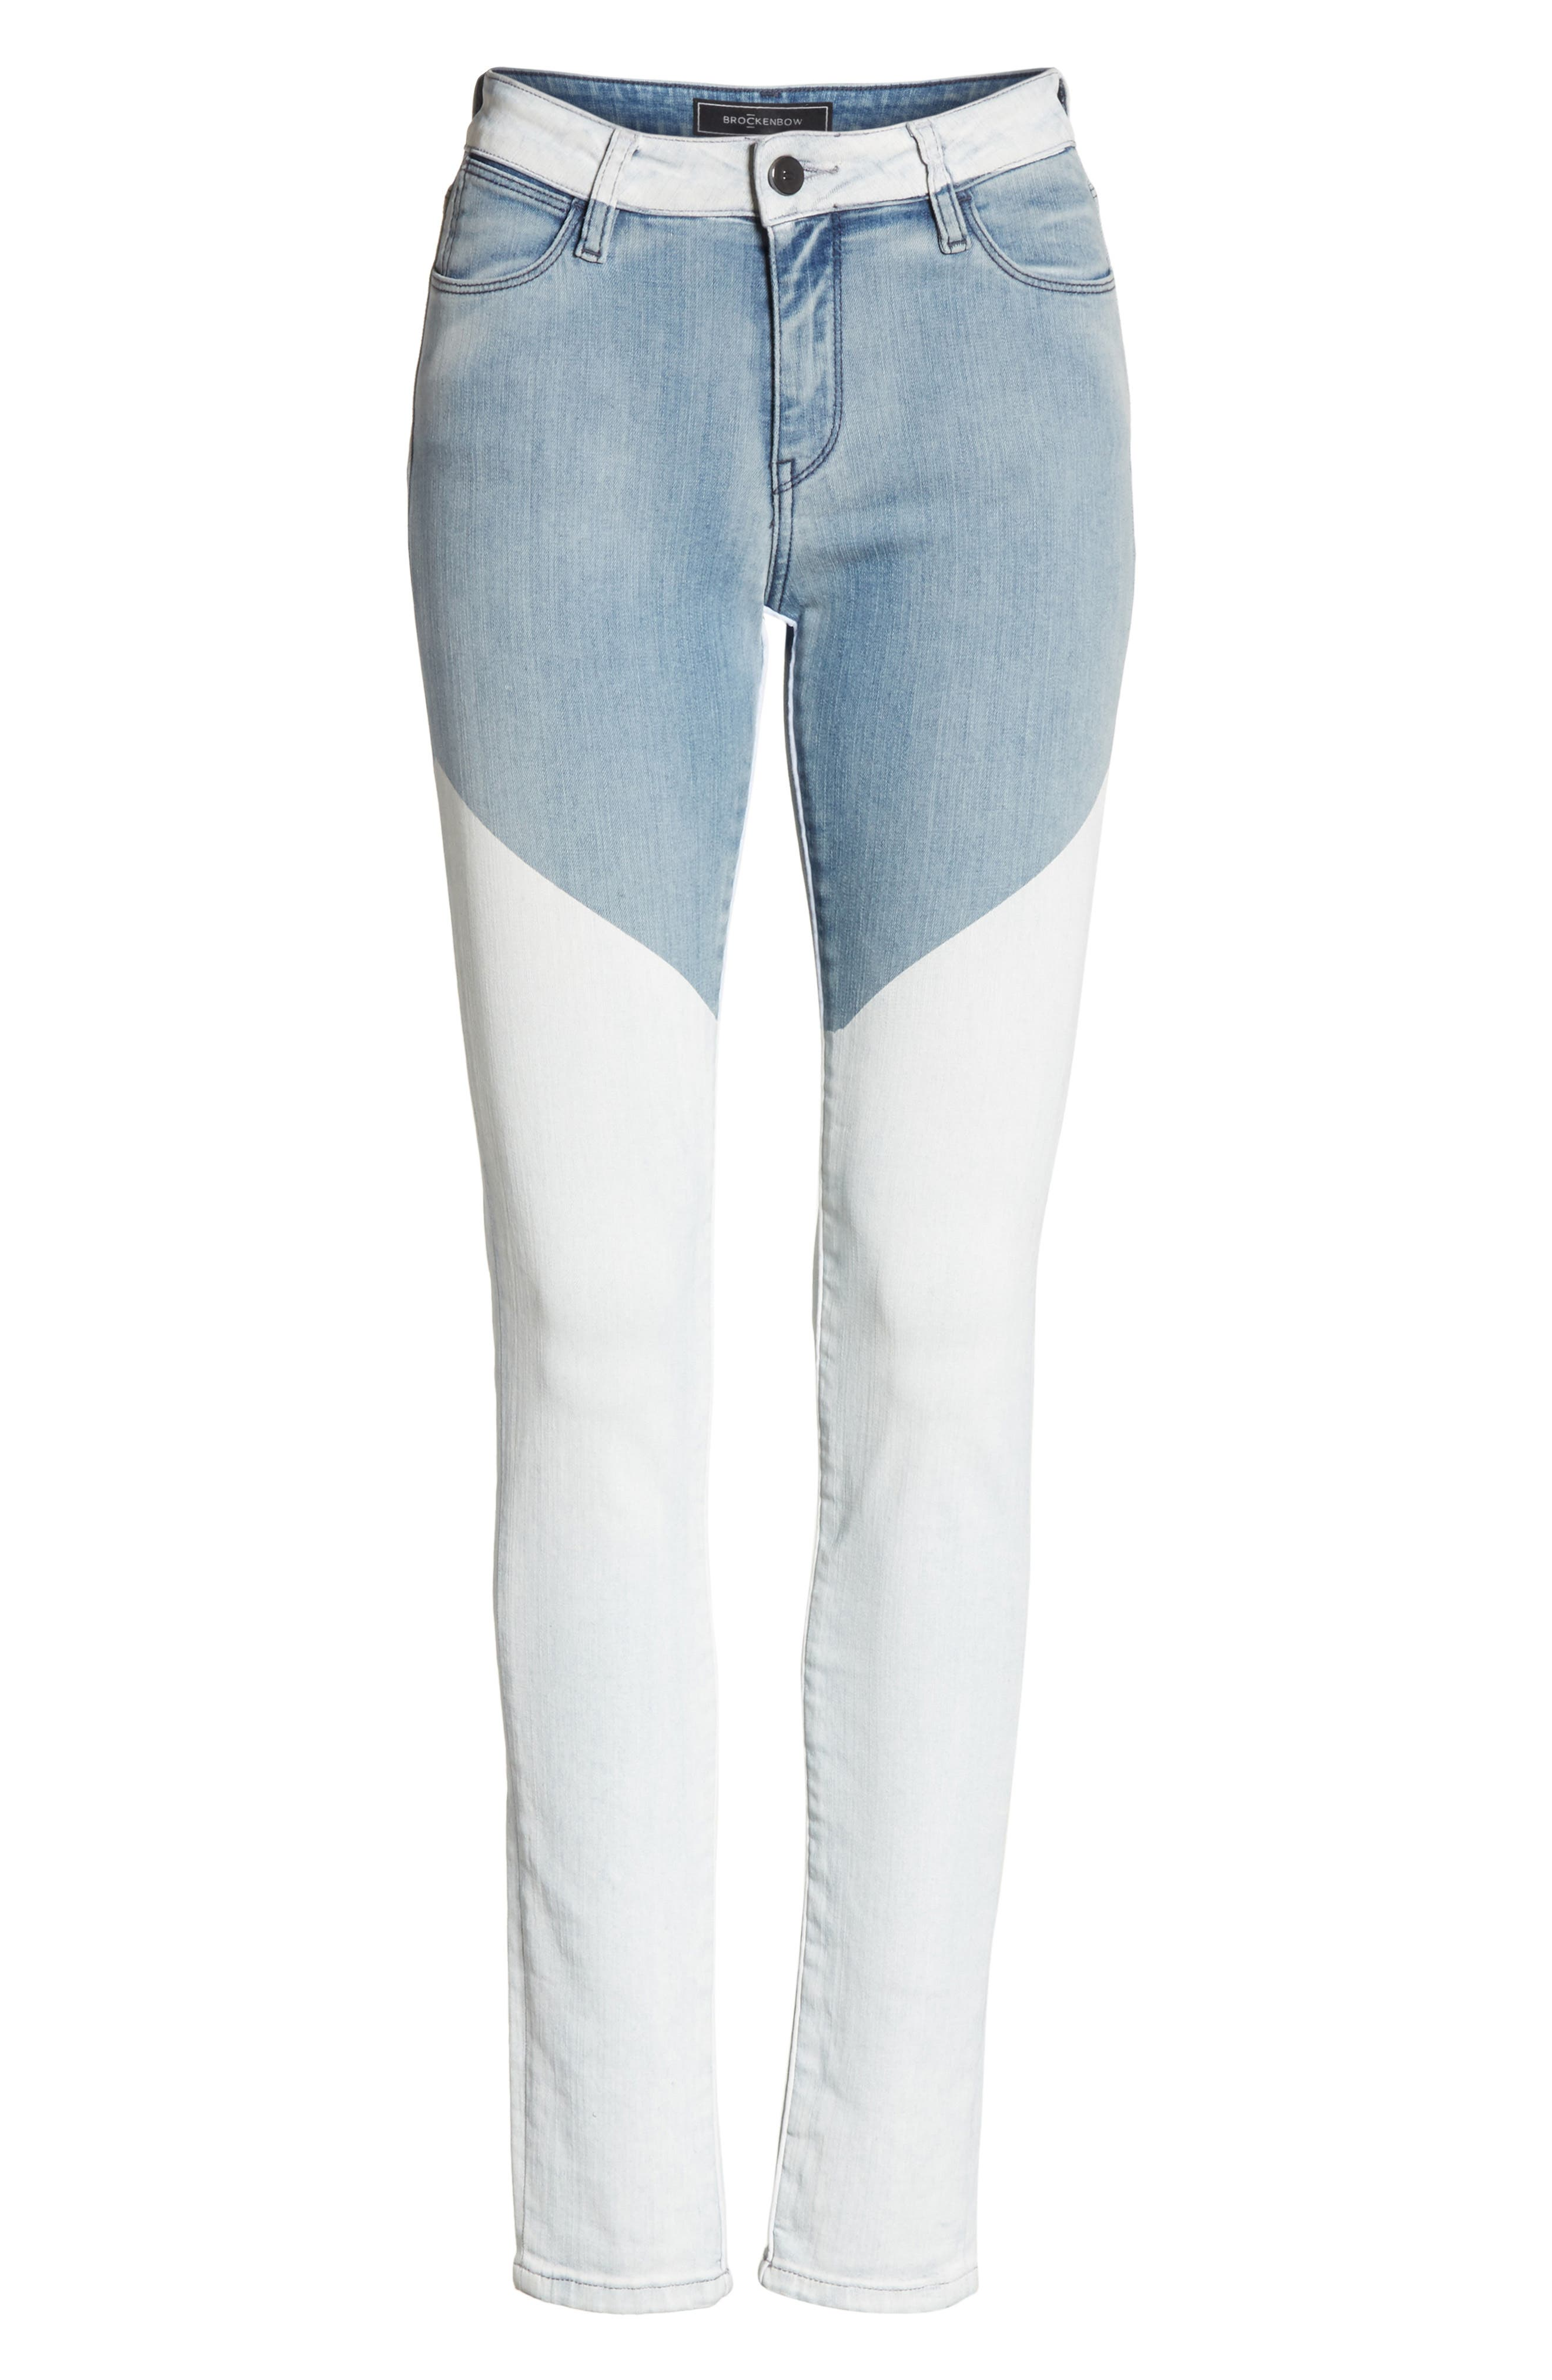 Emma Coated Skinny Jeans,                             Alternate thumbnail 6, color,                             Running Blue